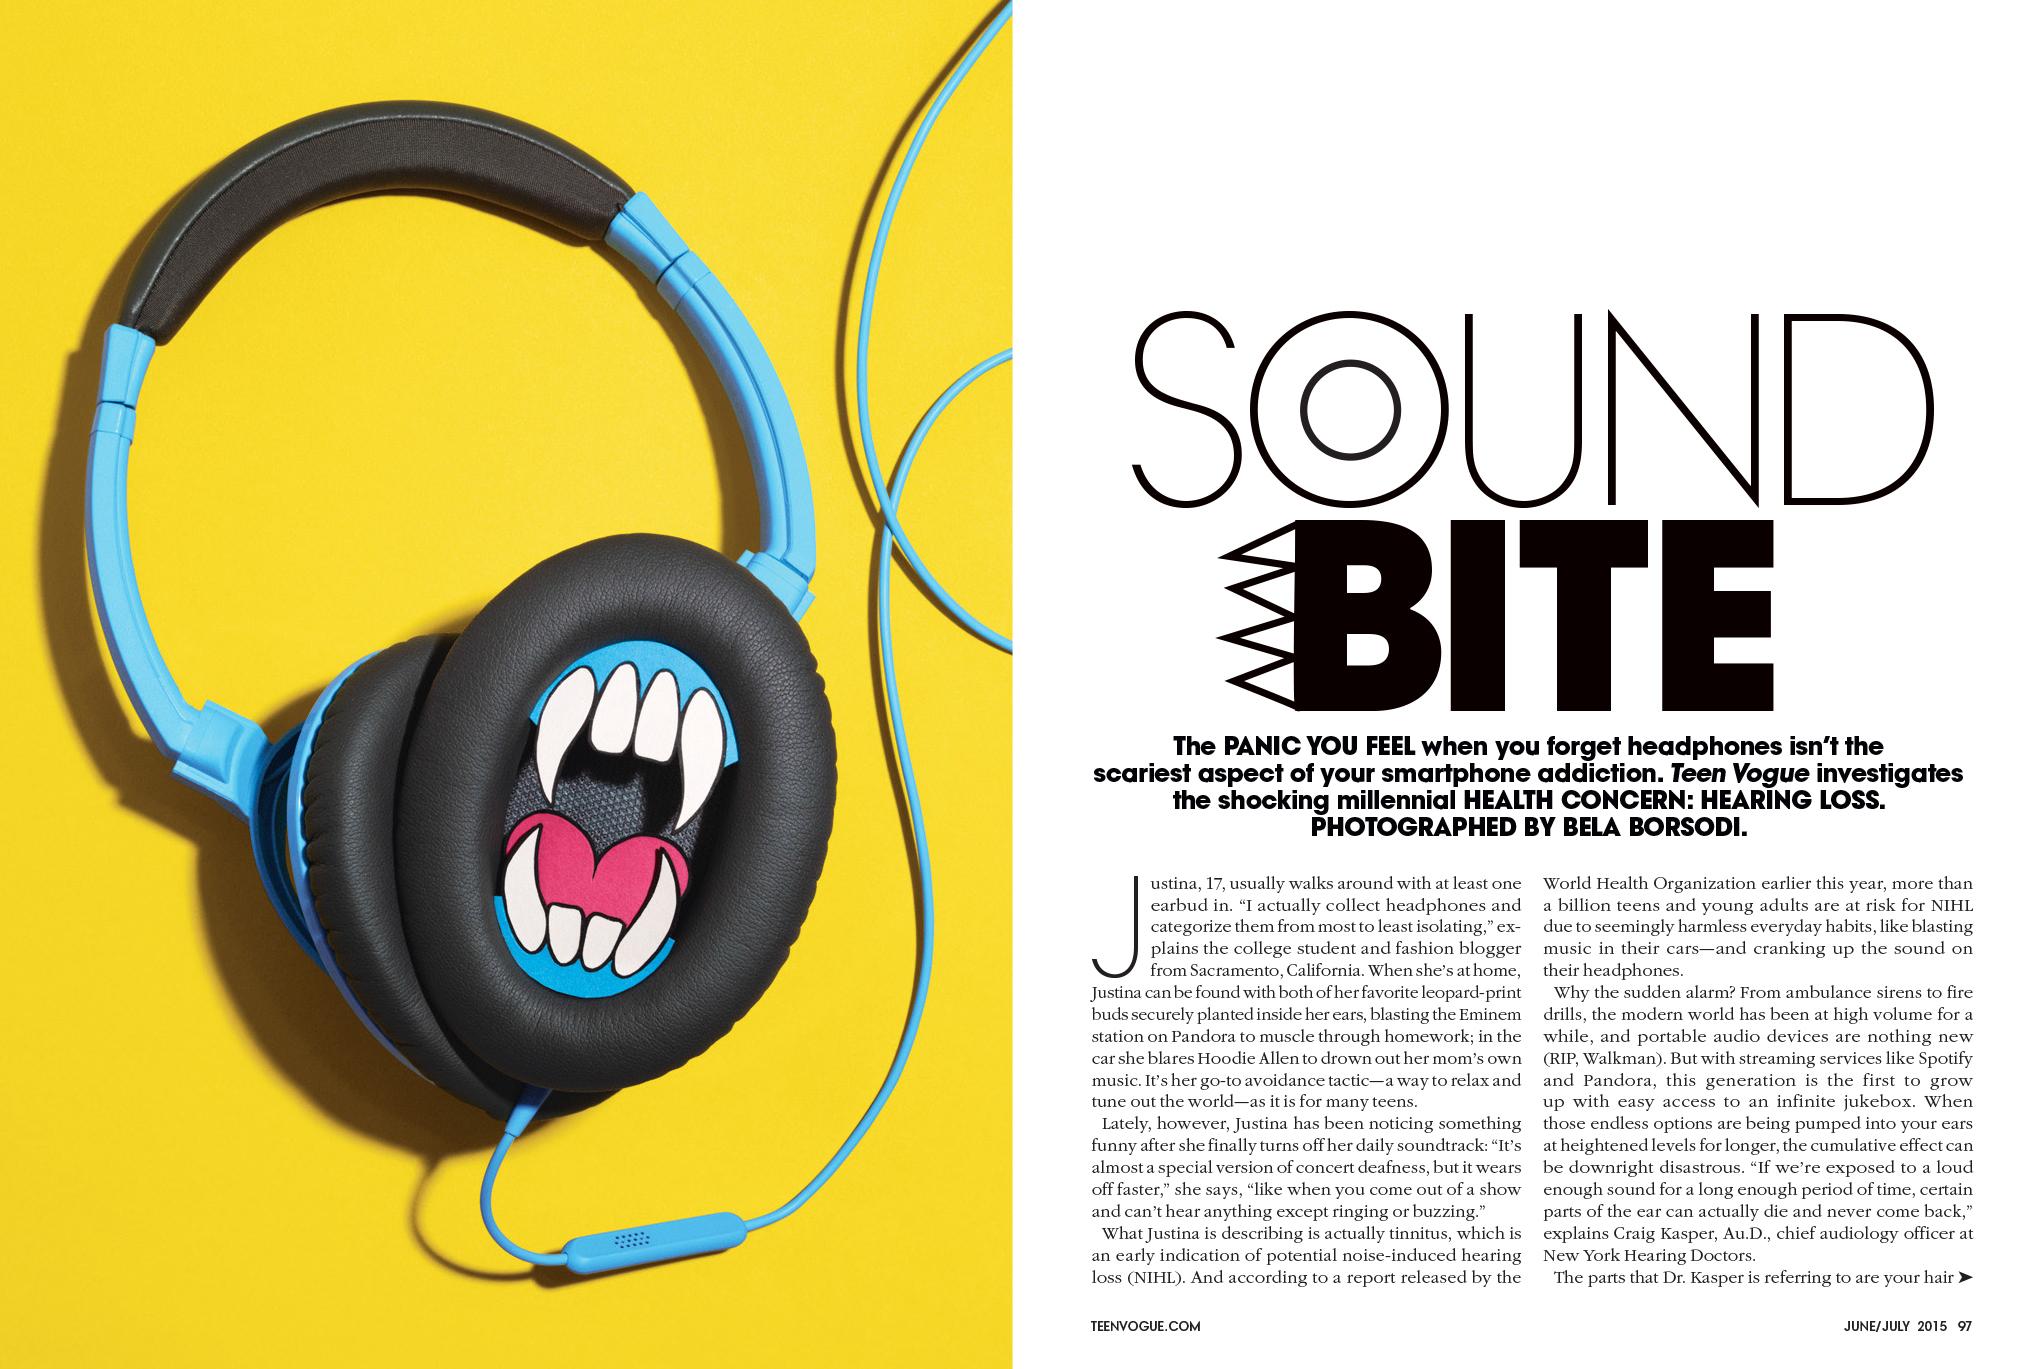 junjul.cob.headphones-1.jpg